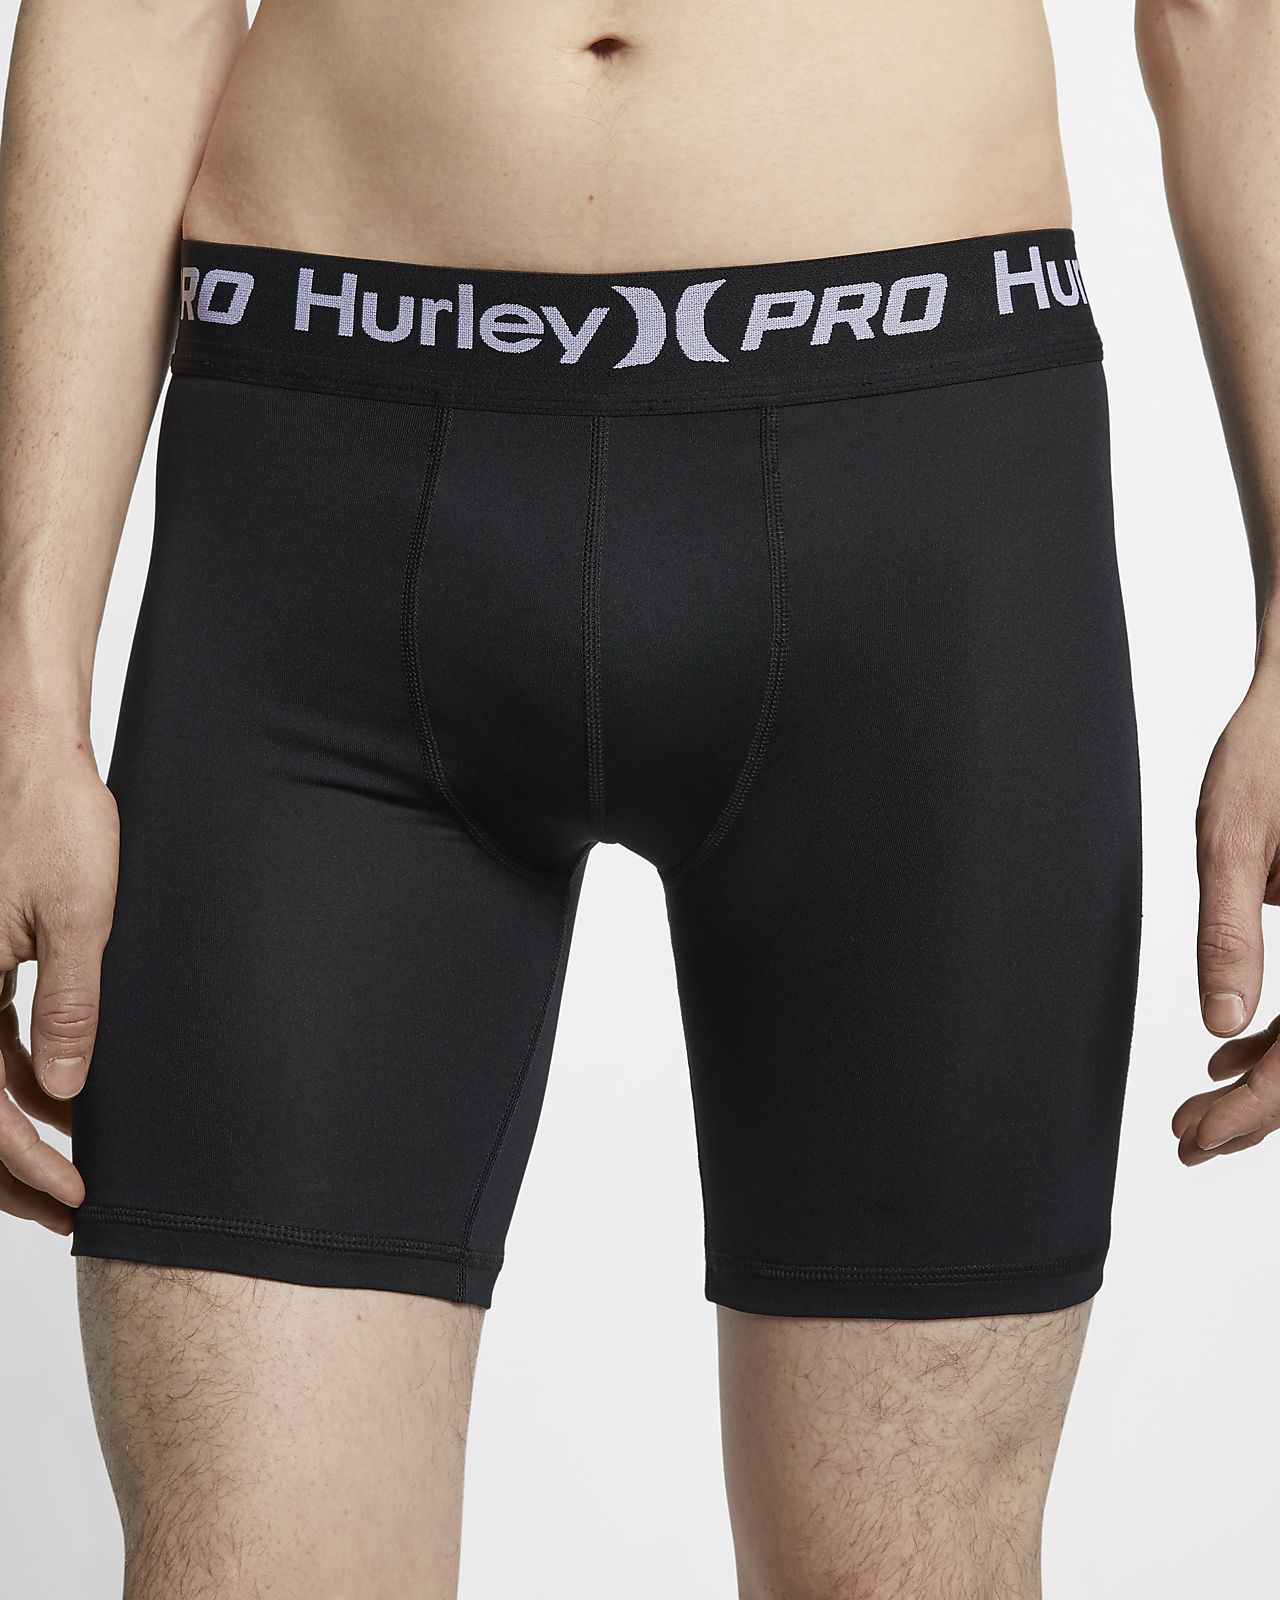 Shorts de tiro de 33 cm para hombre Hurley Pro Light